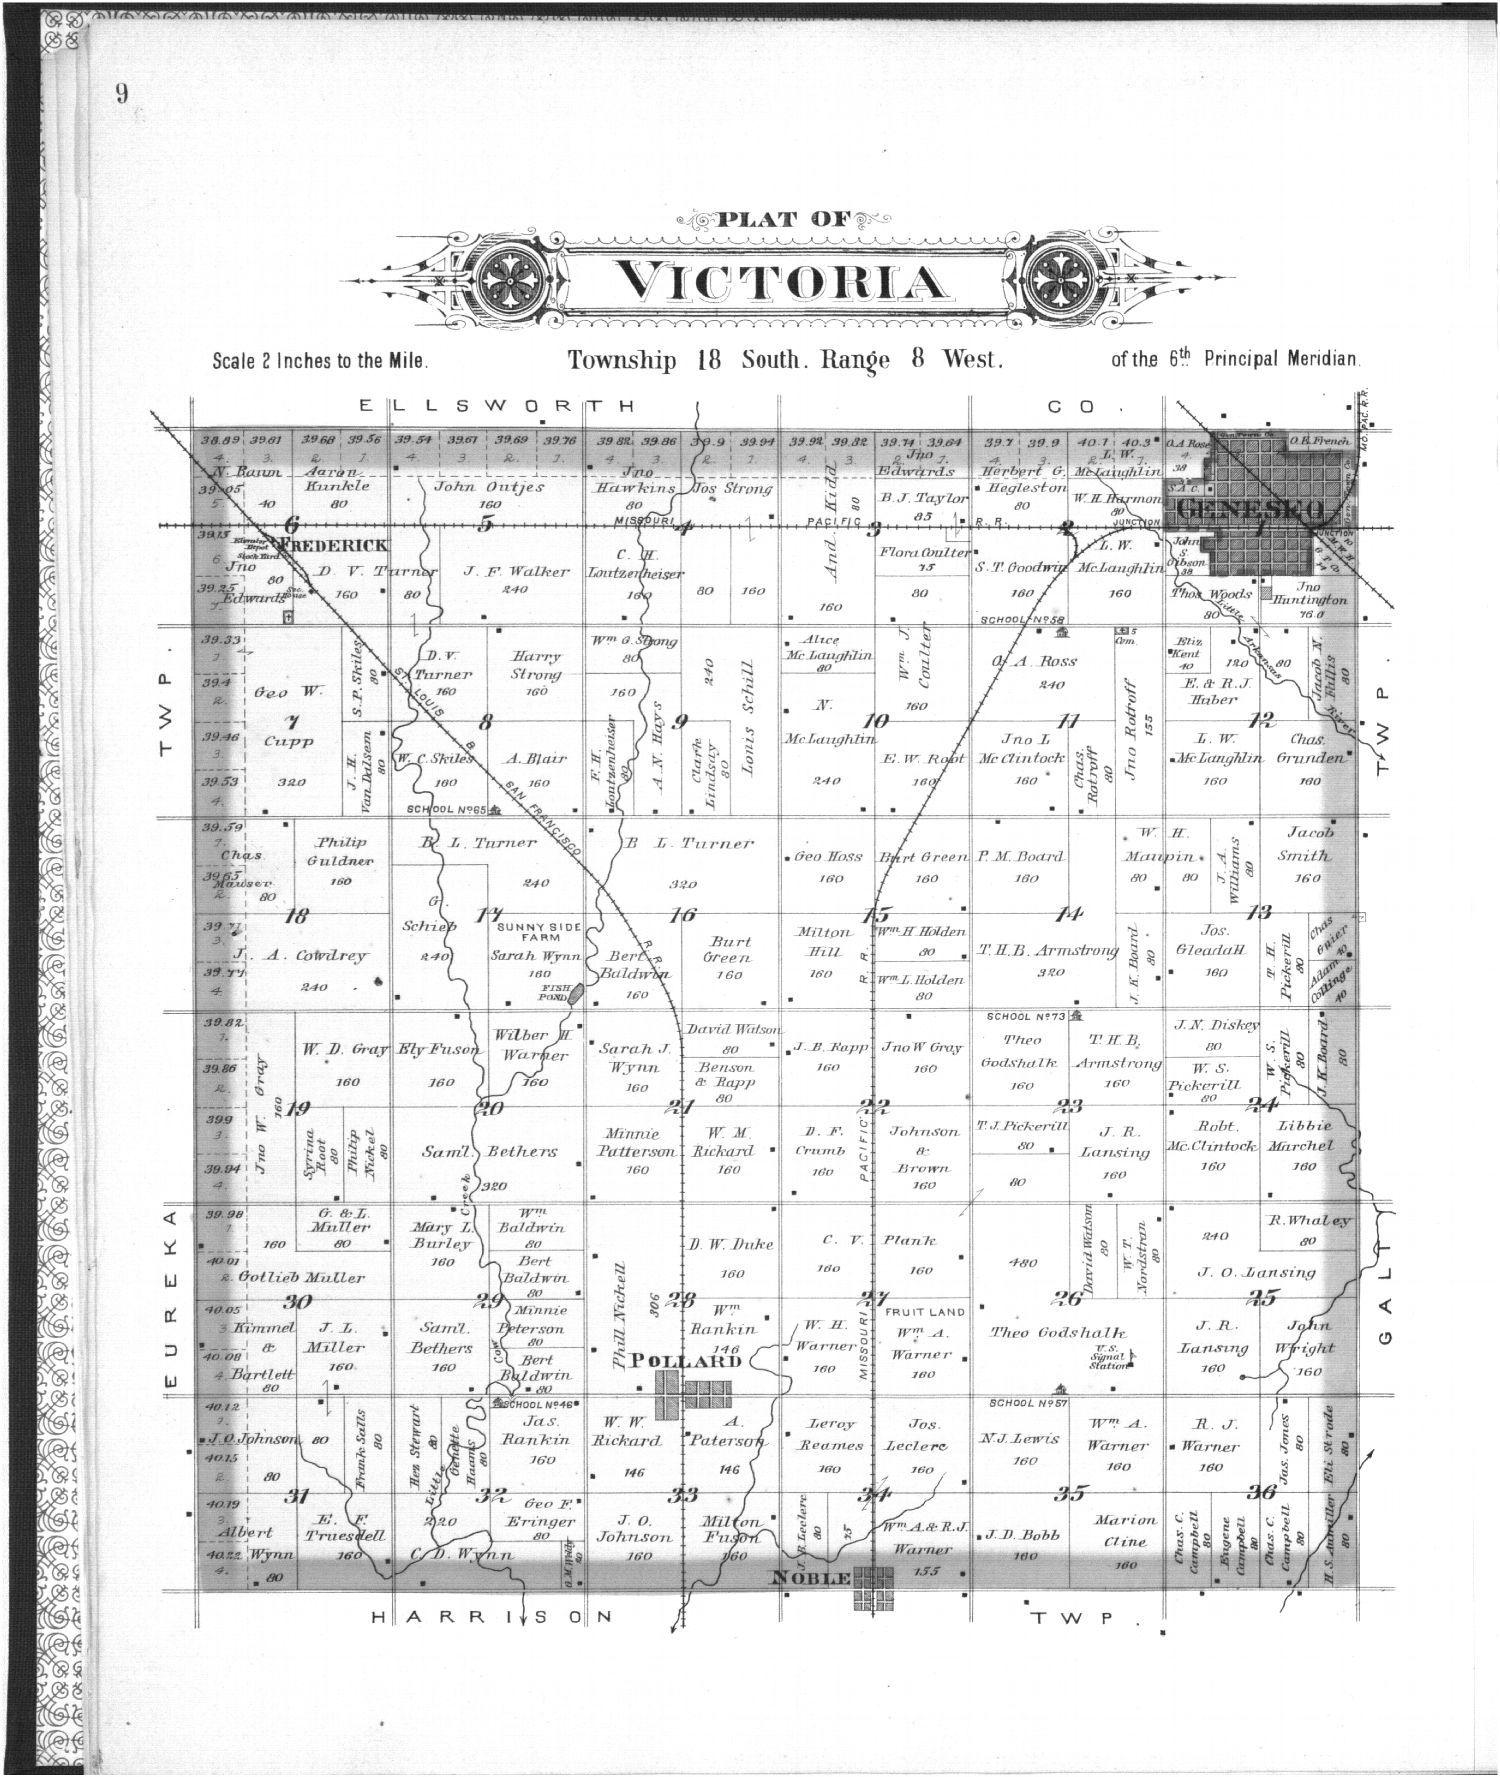 Plat book of Rice County, Kansas - 9